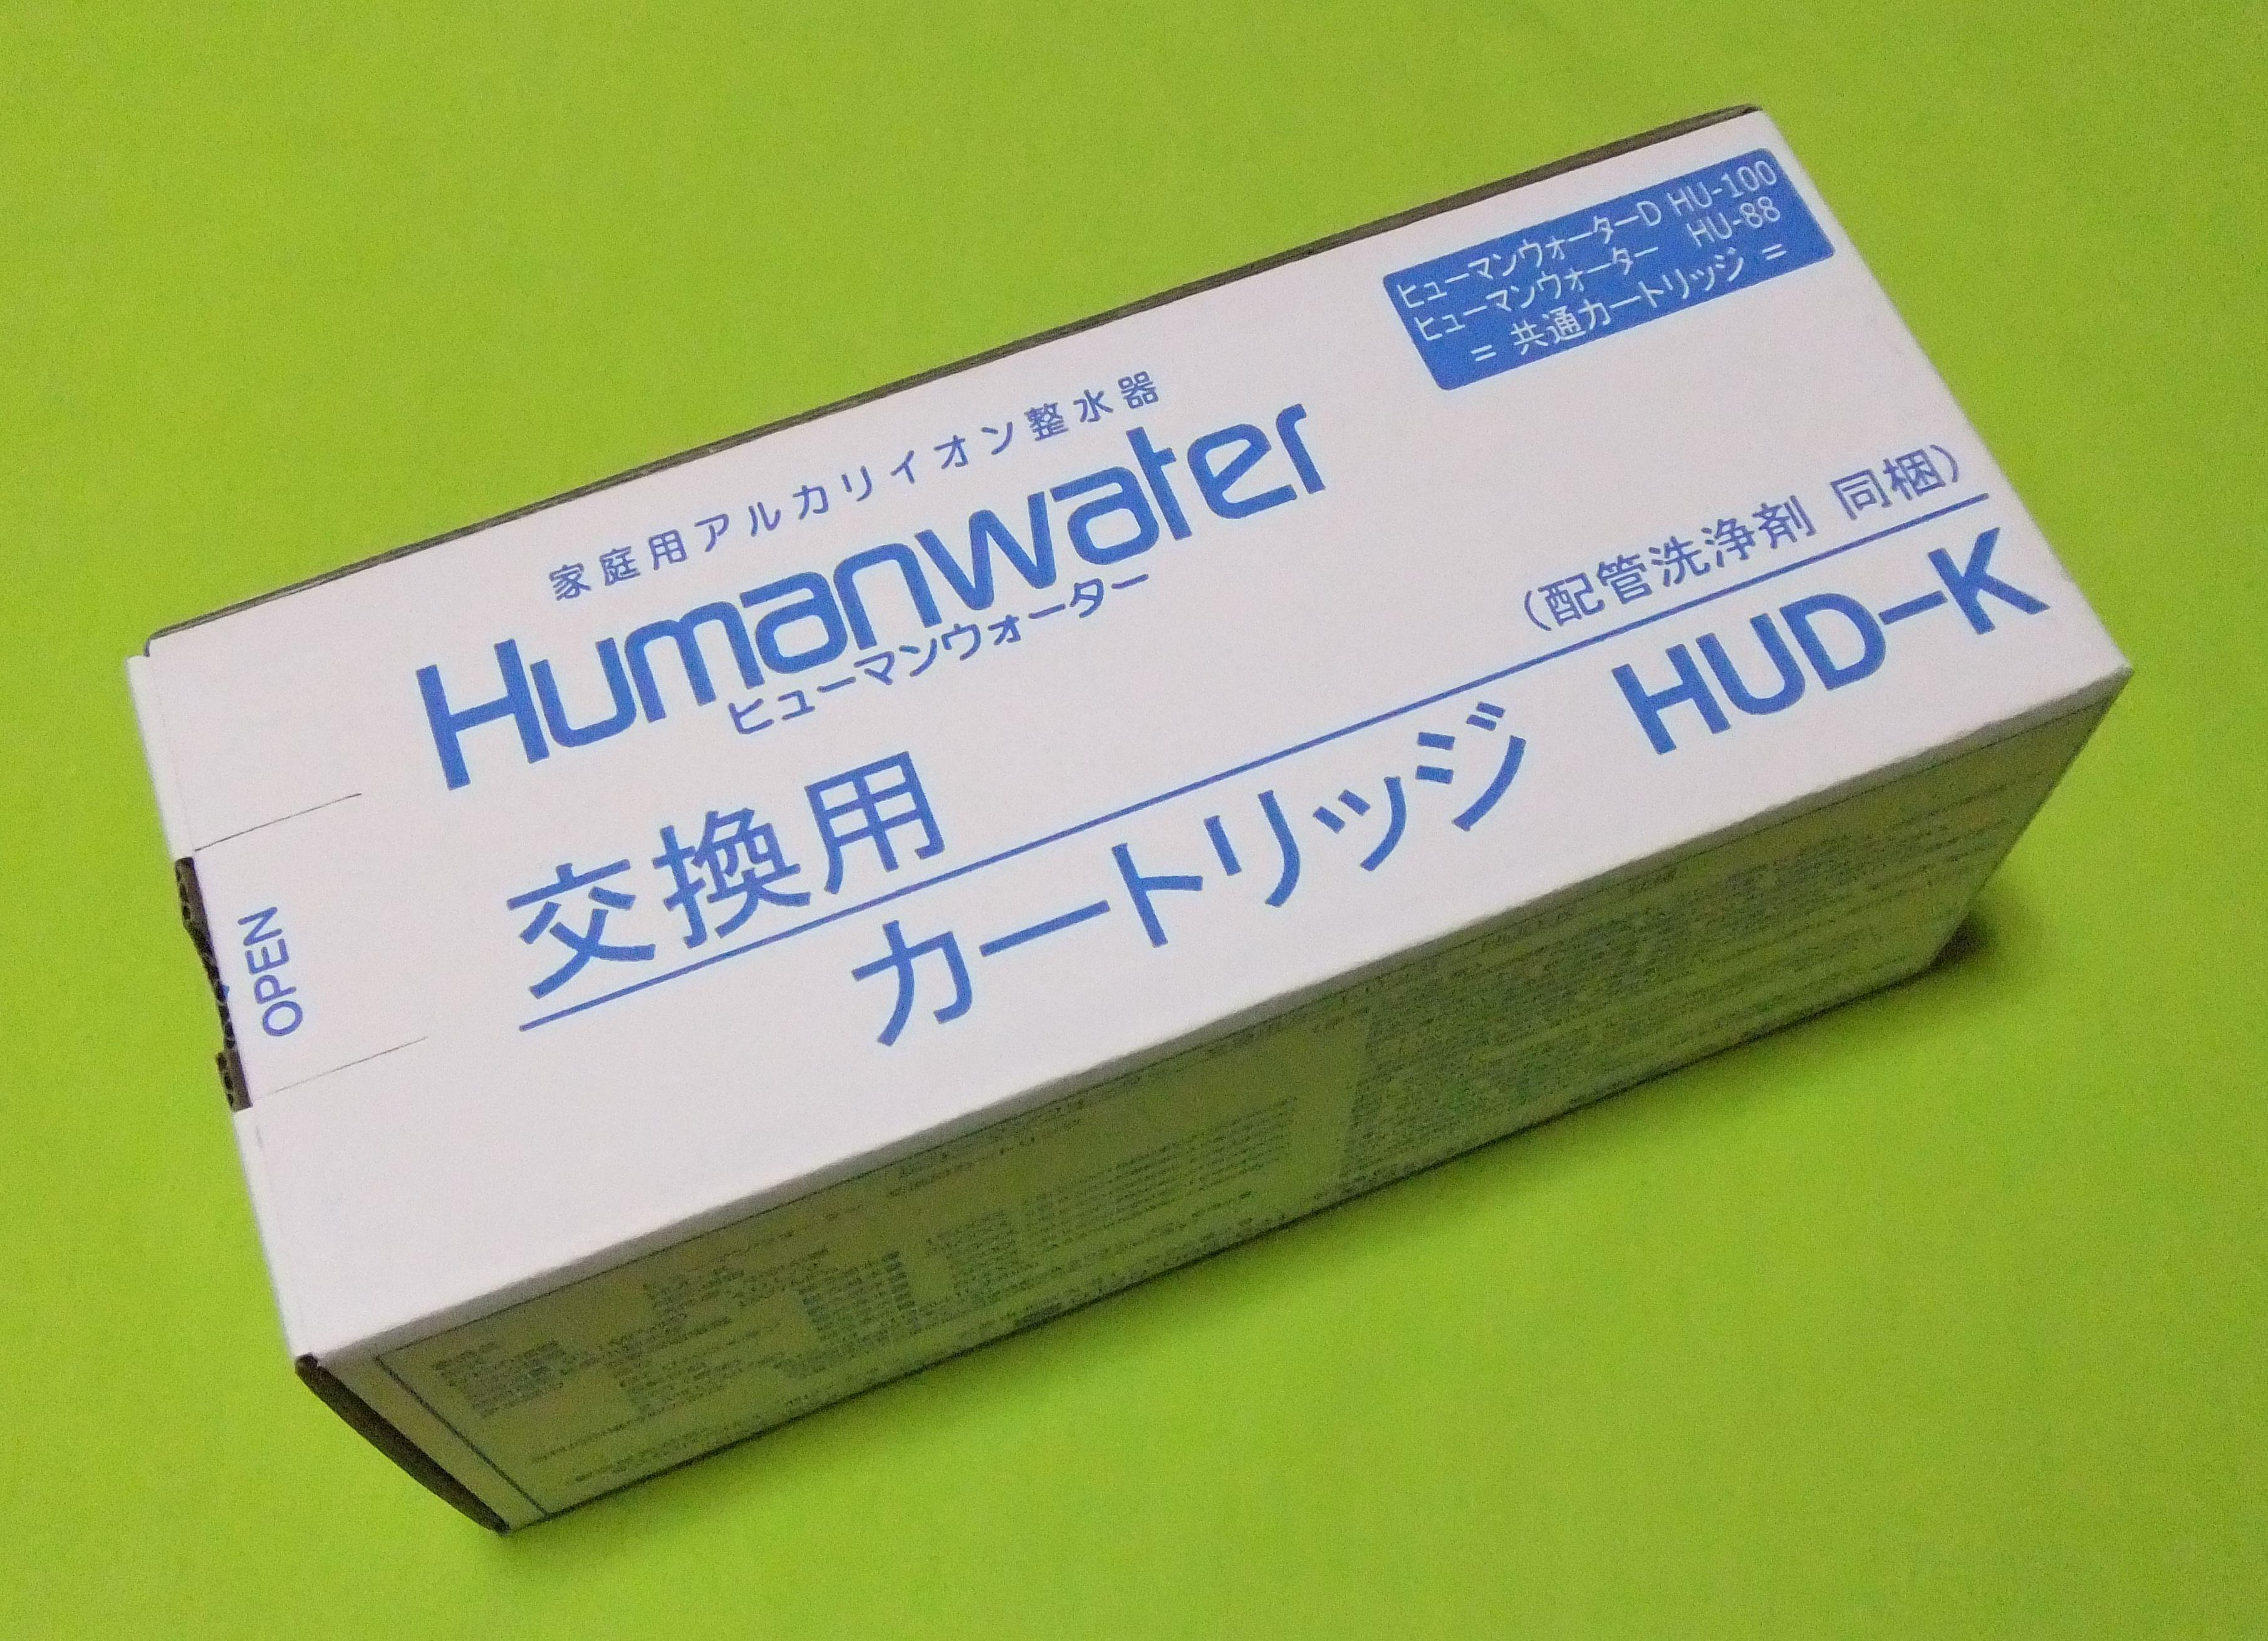 OSGコーポレーション 整水器 HU‐88 HU-100用交換カートリッジ HUD‐K&カルシウム剤セット 送料無料